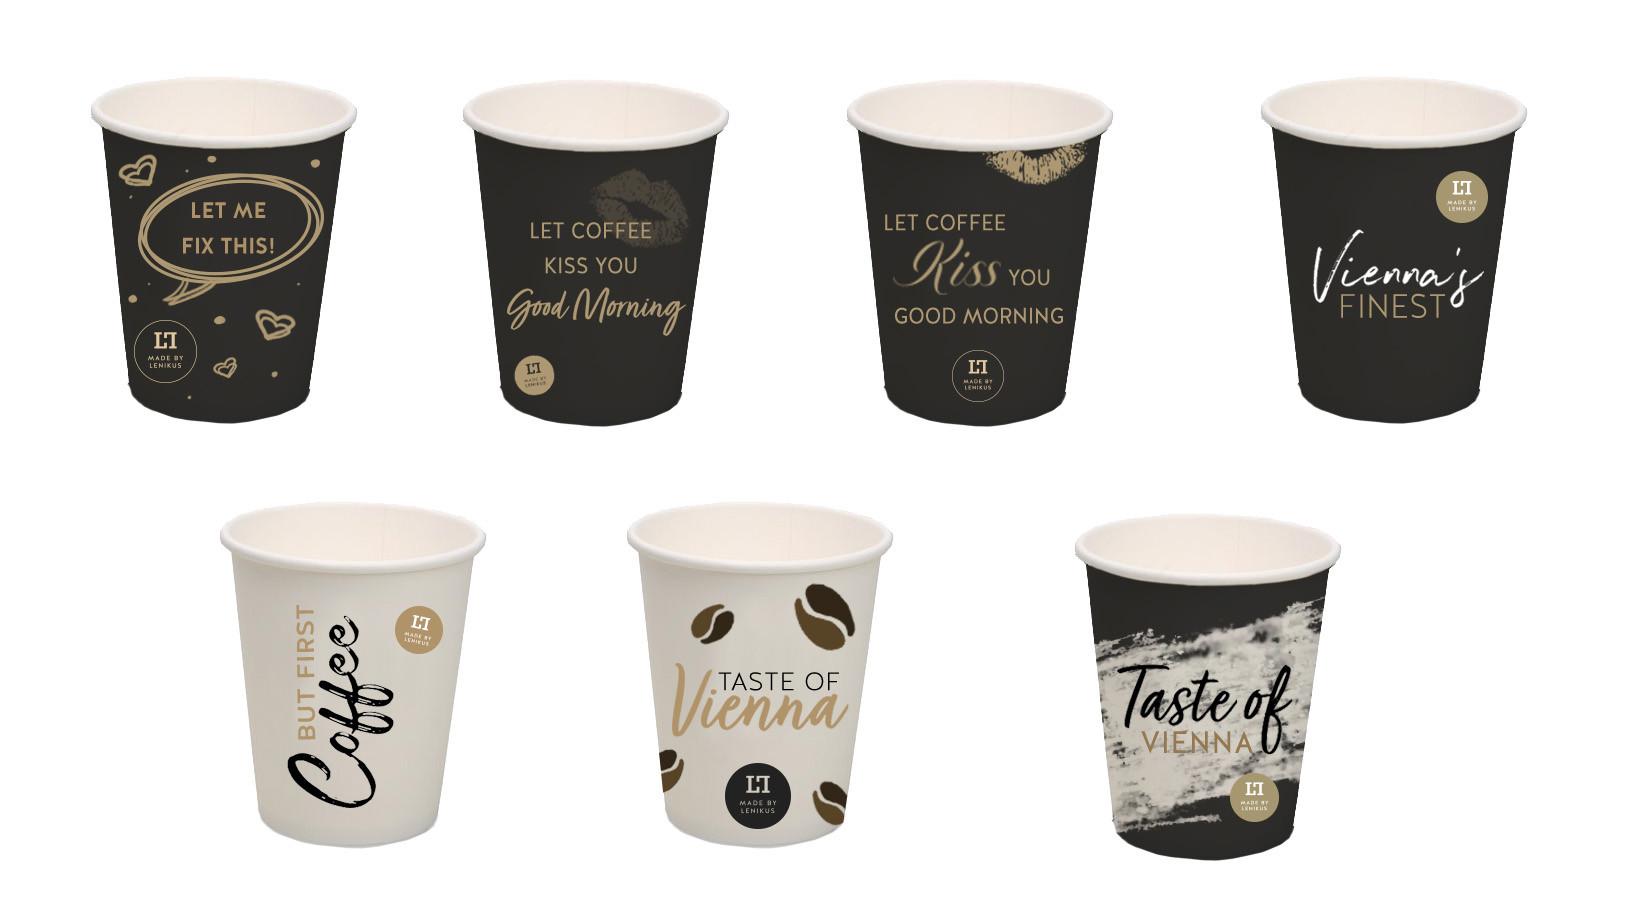 LENIKUS Entwürfe Kaffeebecher, 2018